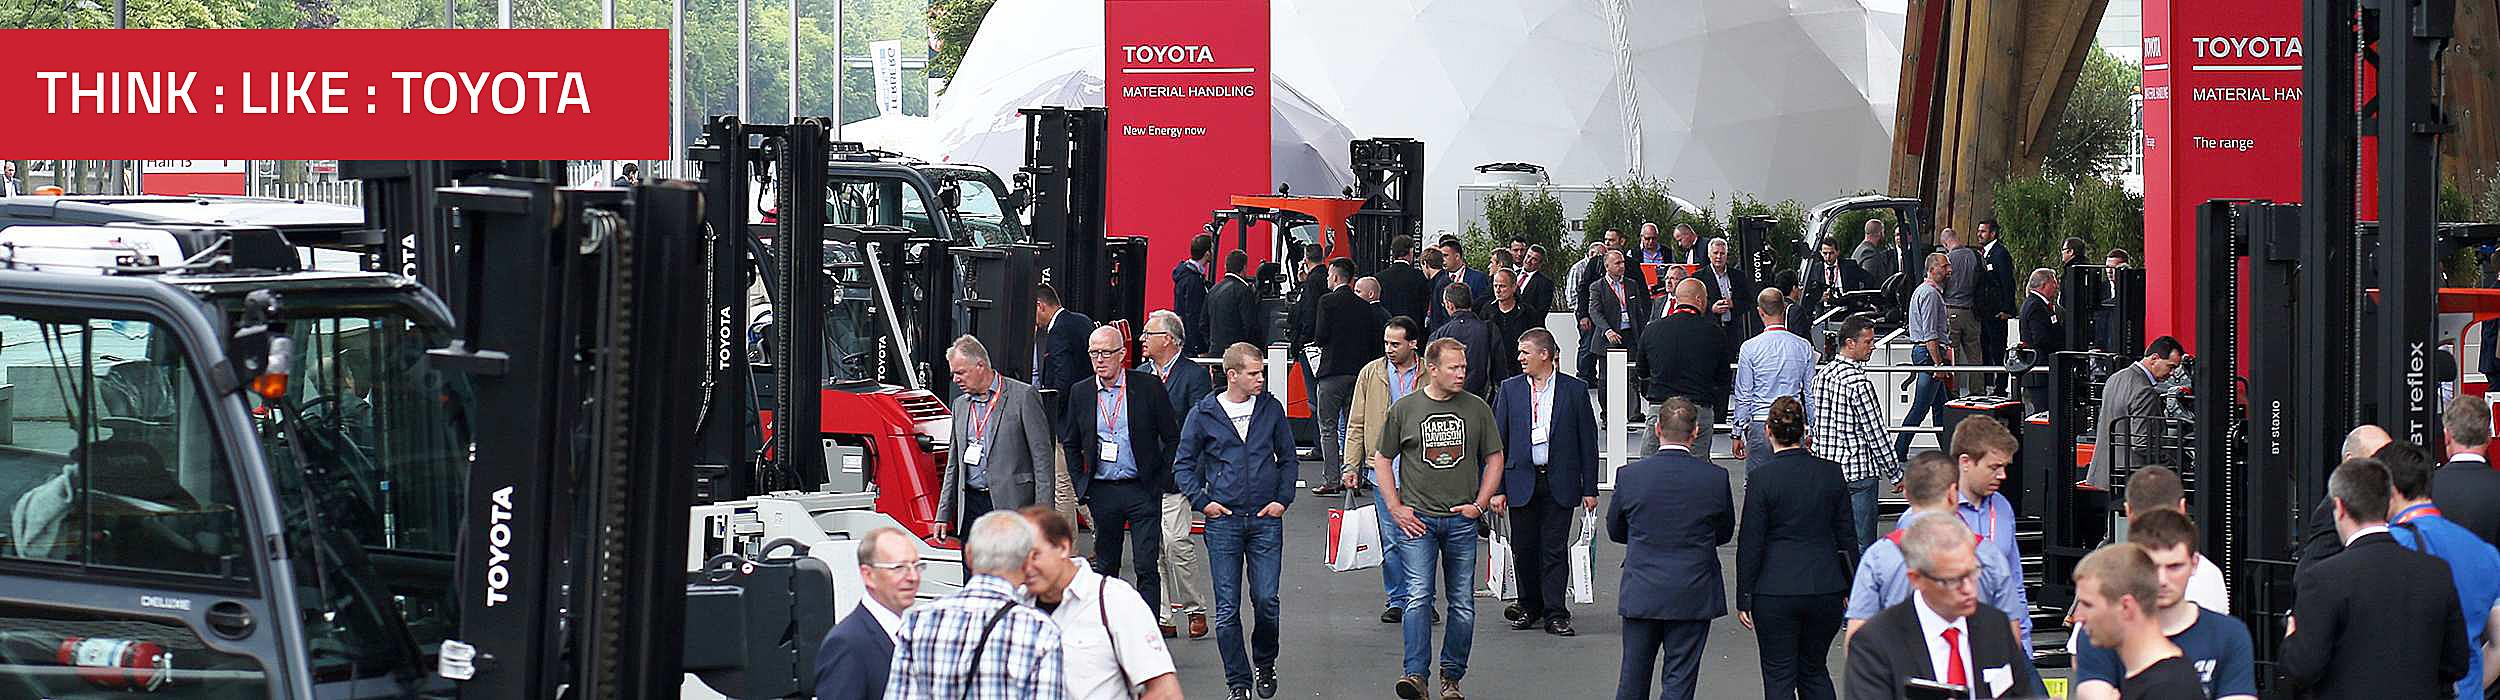 Toyota på CeMAT Hannover messen